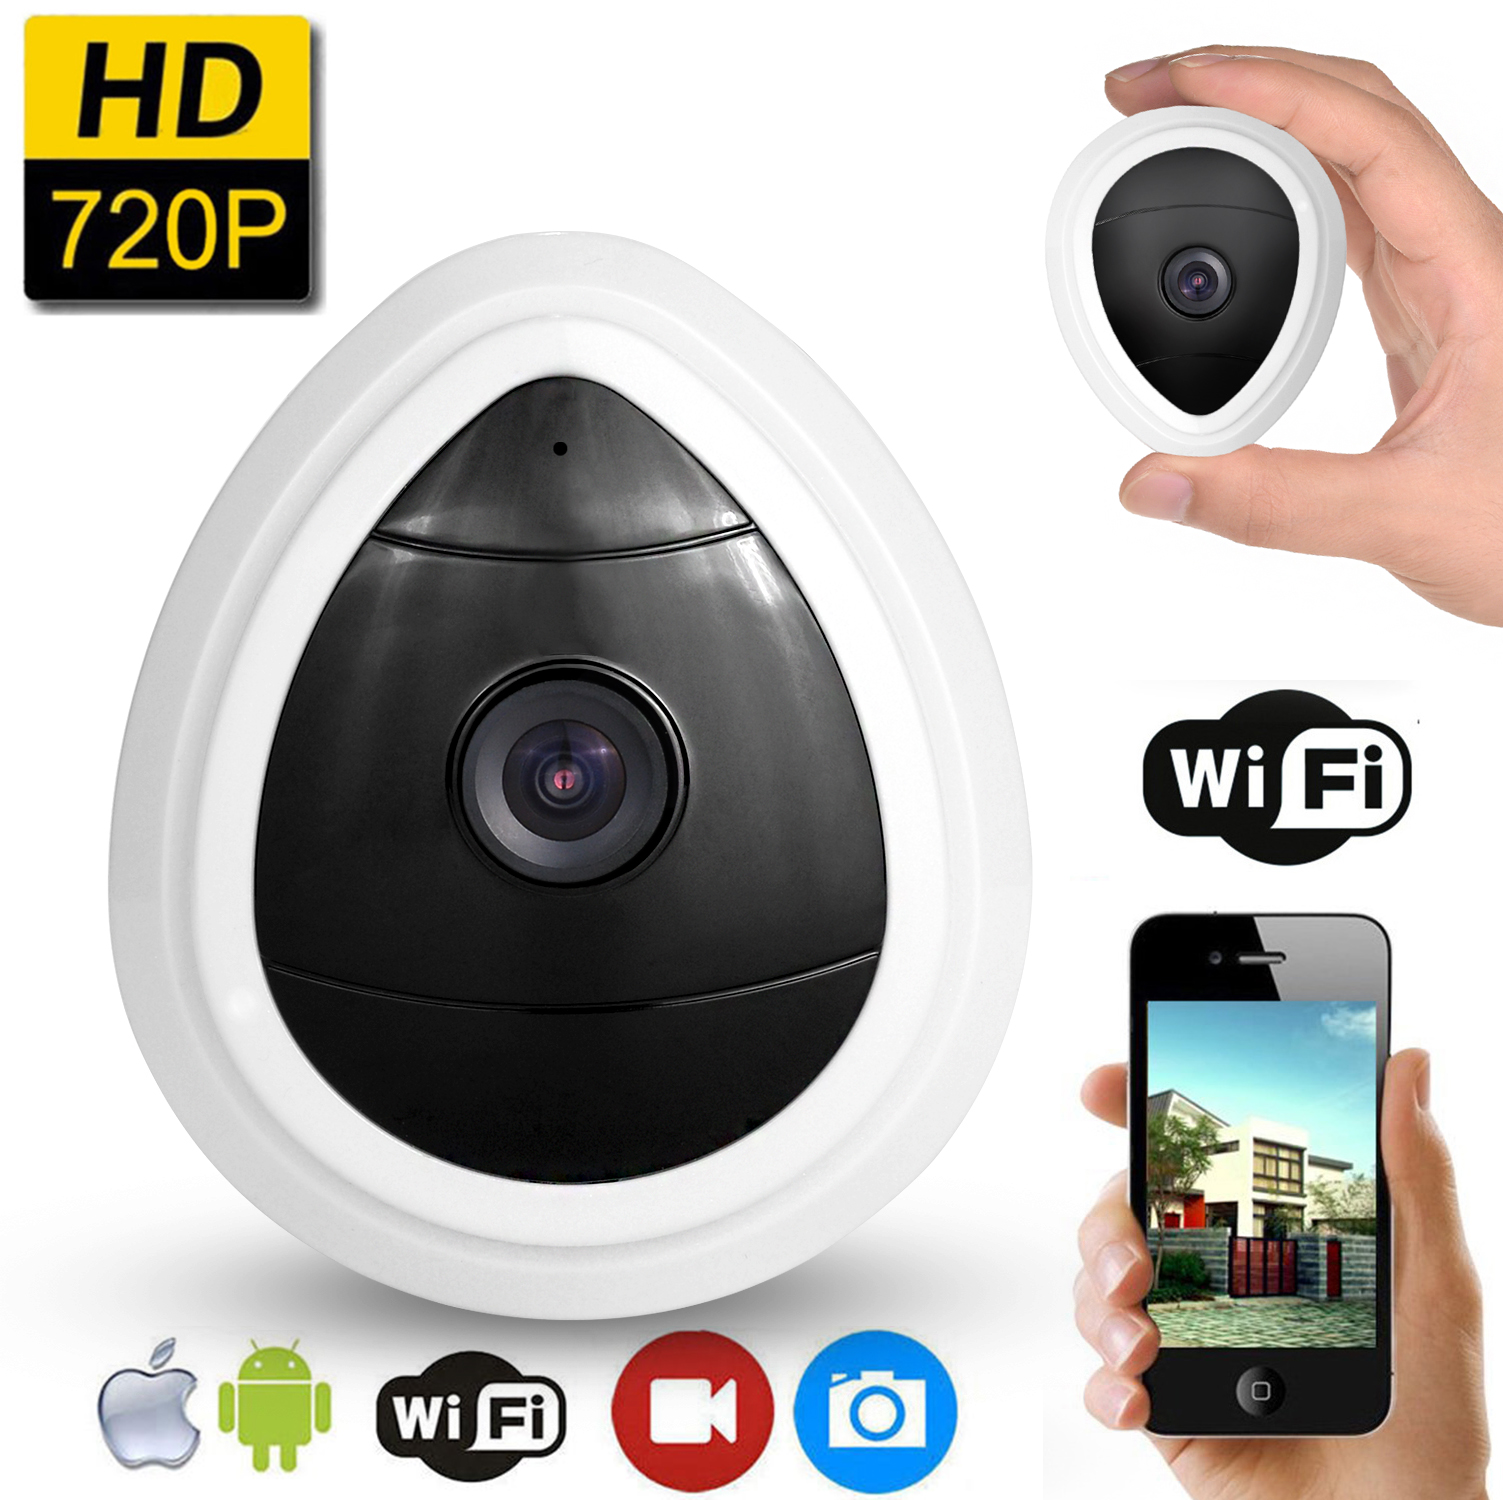 Mini Wifi IP Camera,AGPtek 720P HD Home WiFi Wireless Security Surveillance Camera System